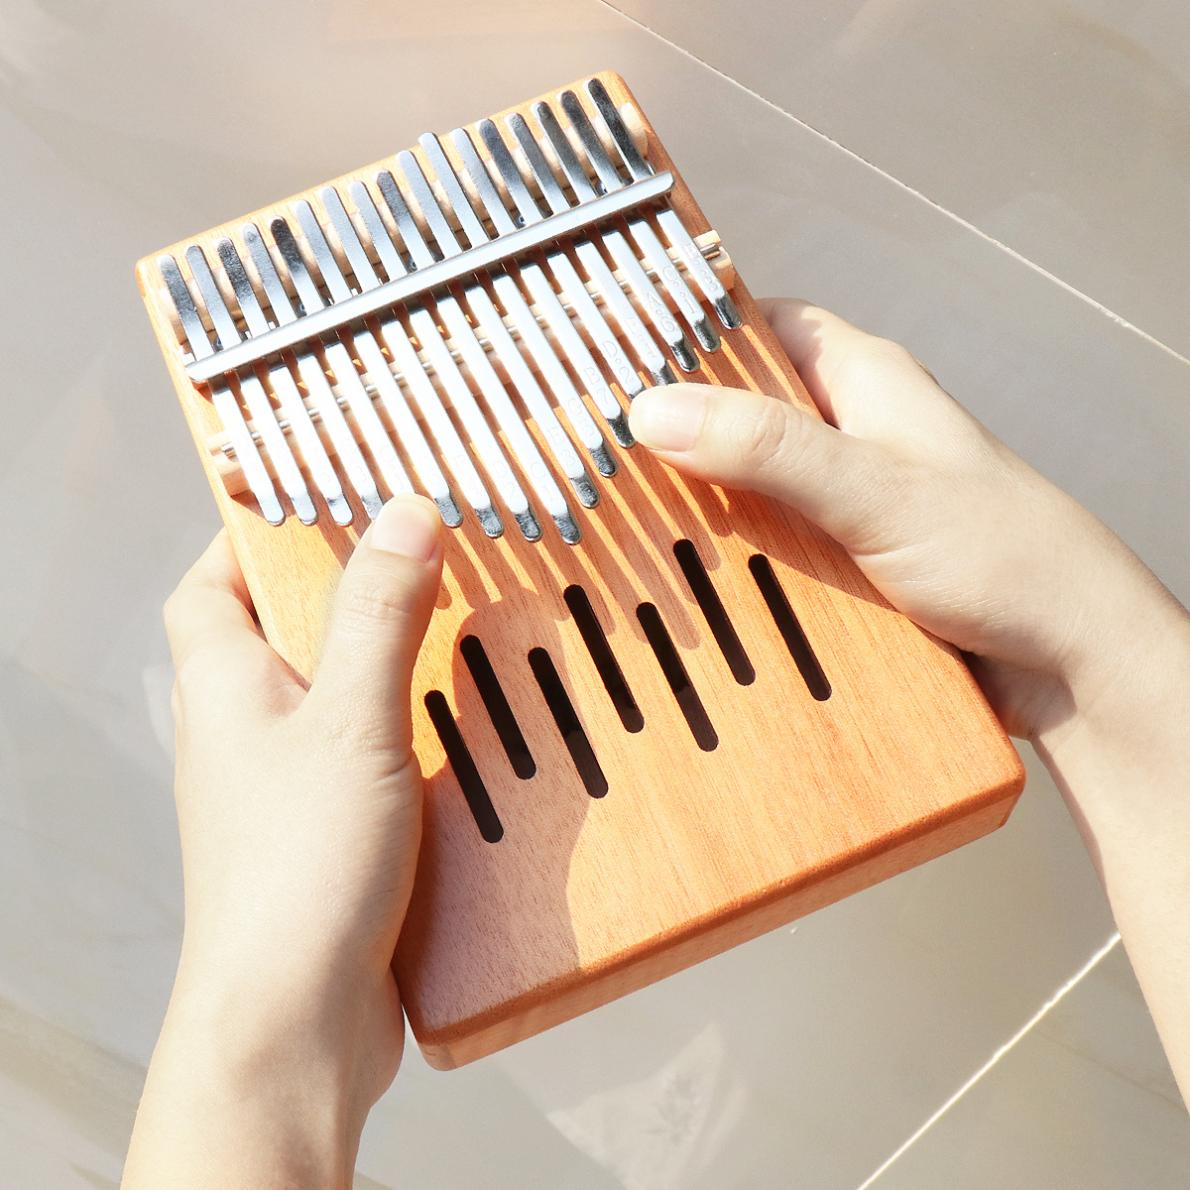 17 Key Kalimba Single Board Mahogany Waterfall Sound Hole Mbira Mini Keyboard Instrument Thumb Piano enlarge